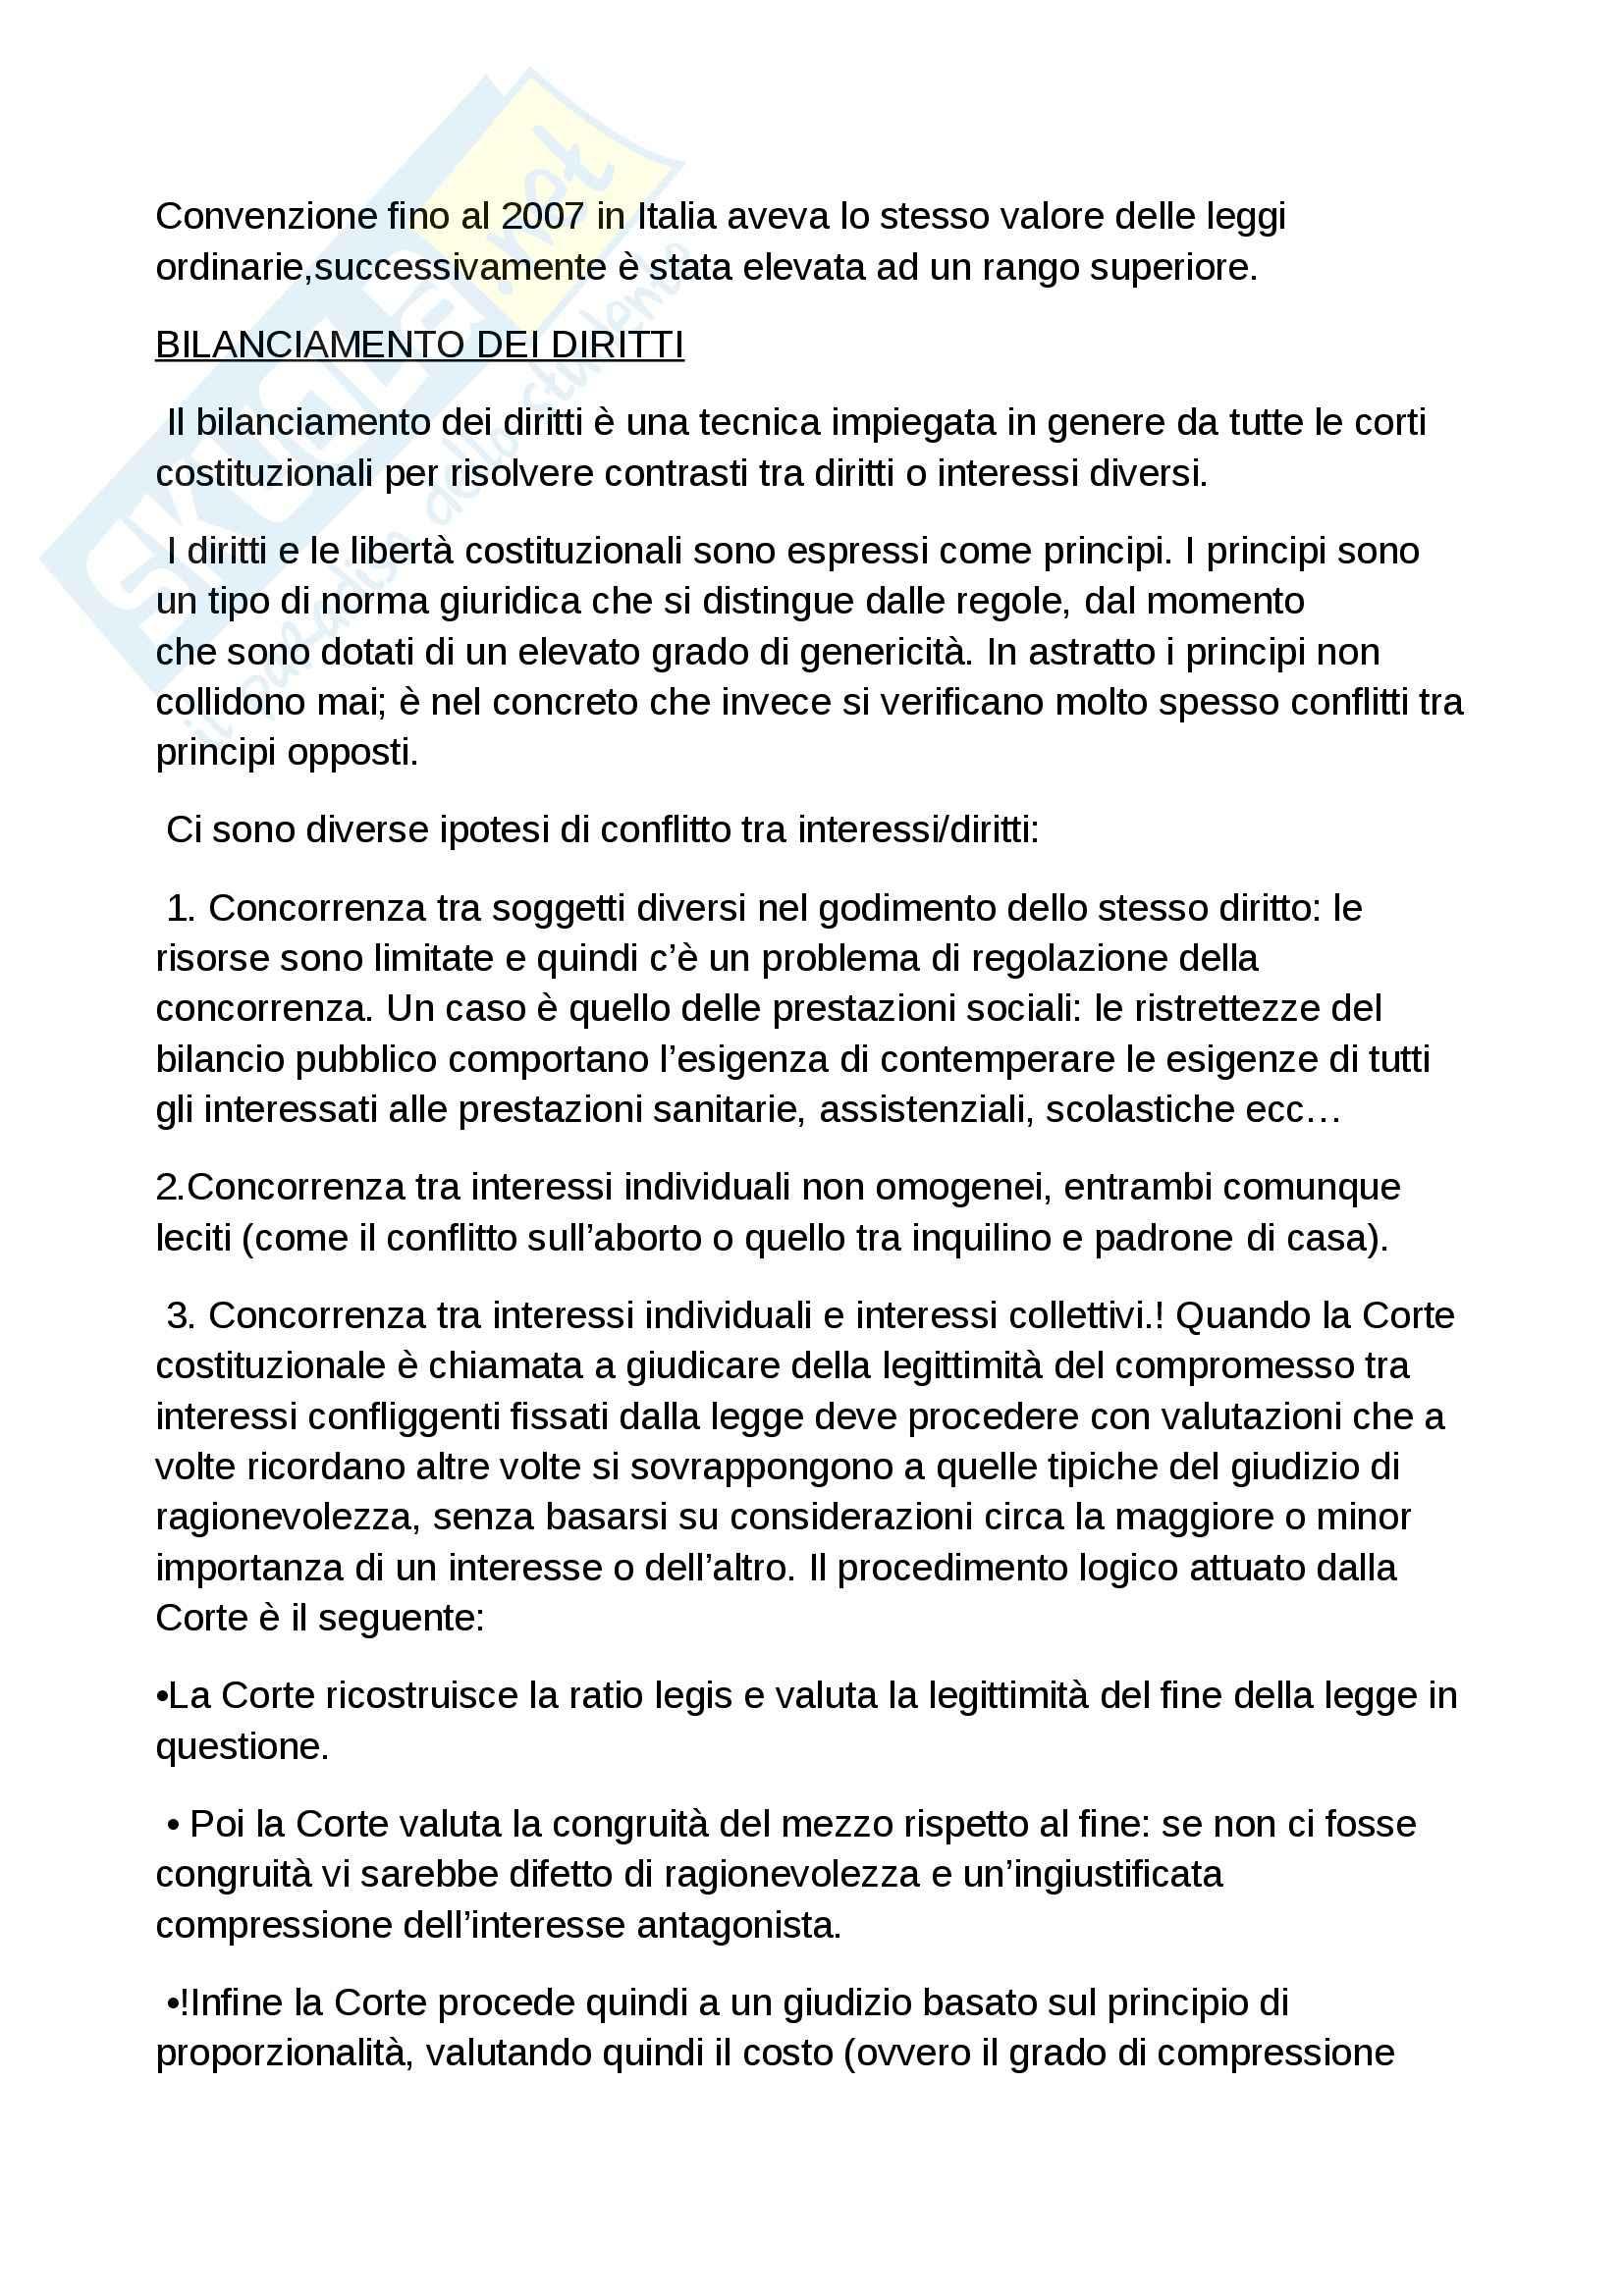 Riassunto esame diritto costituzionale, prof. Grosso, libro Diritto costituzionale, Bin, Pitruzzella Pag. 86